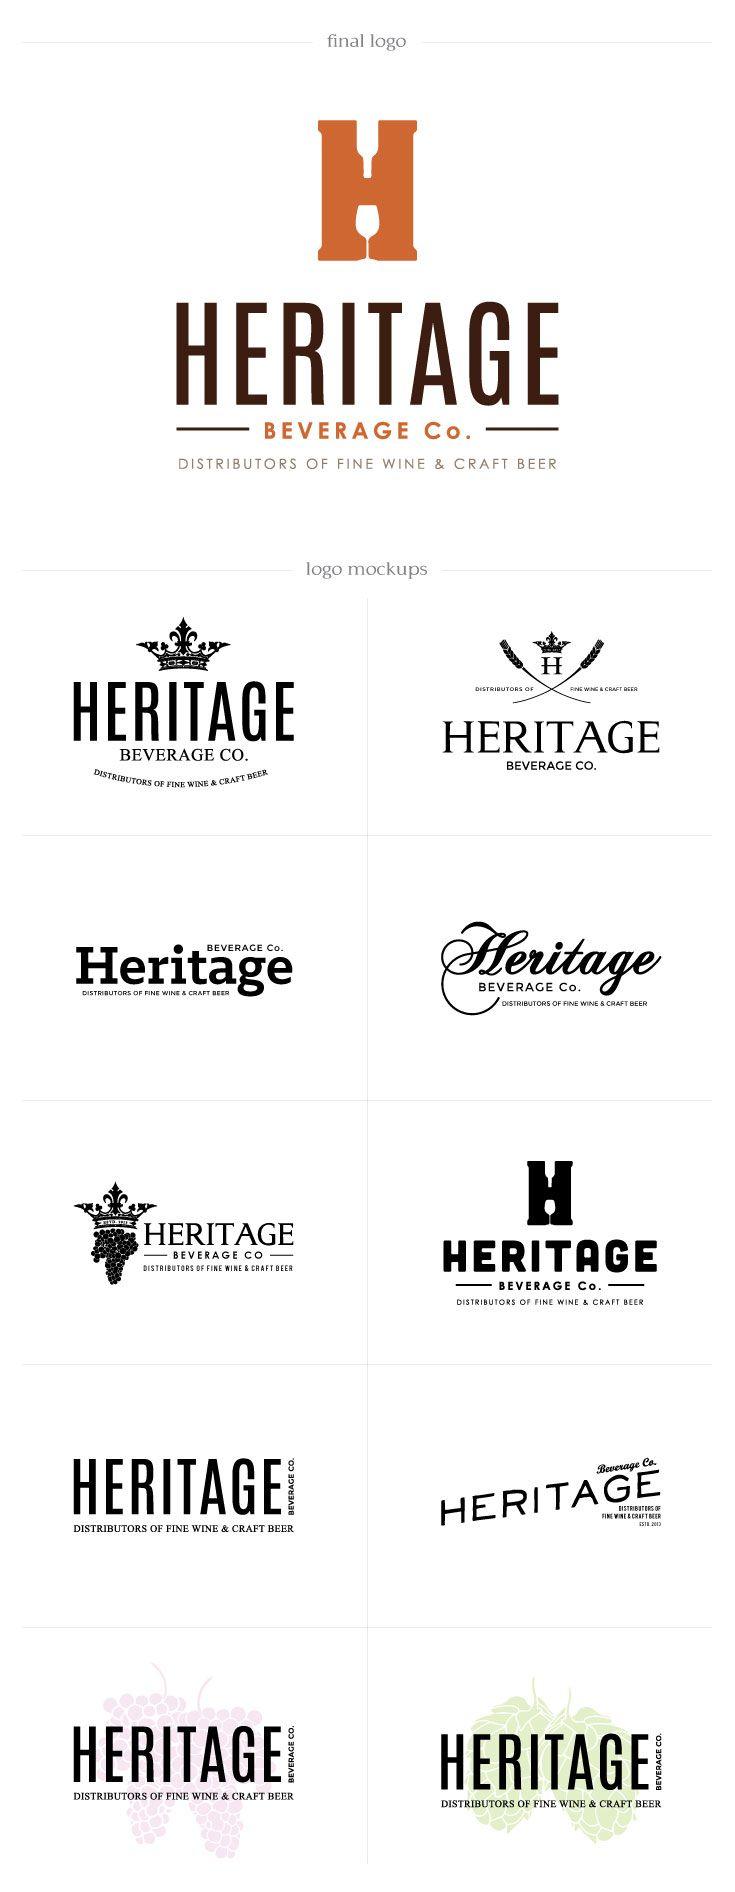 Heritage Beverage Co  -  DesAutels Designs | branding & logo developement